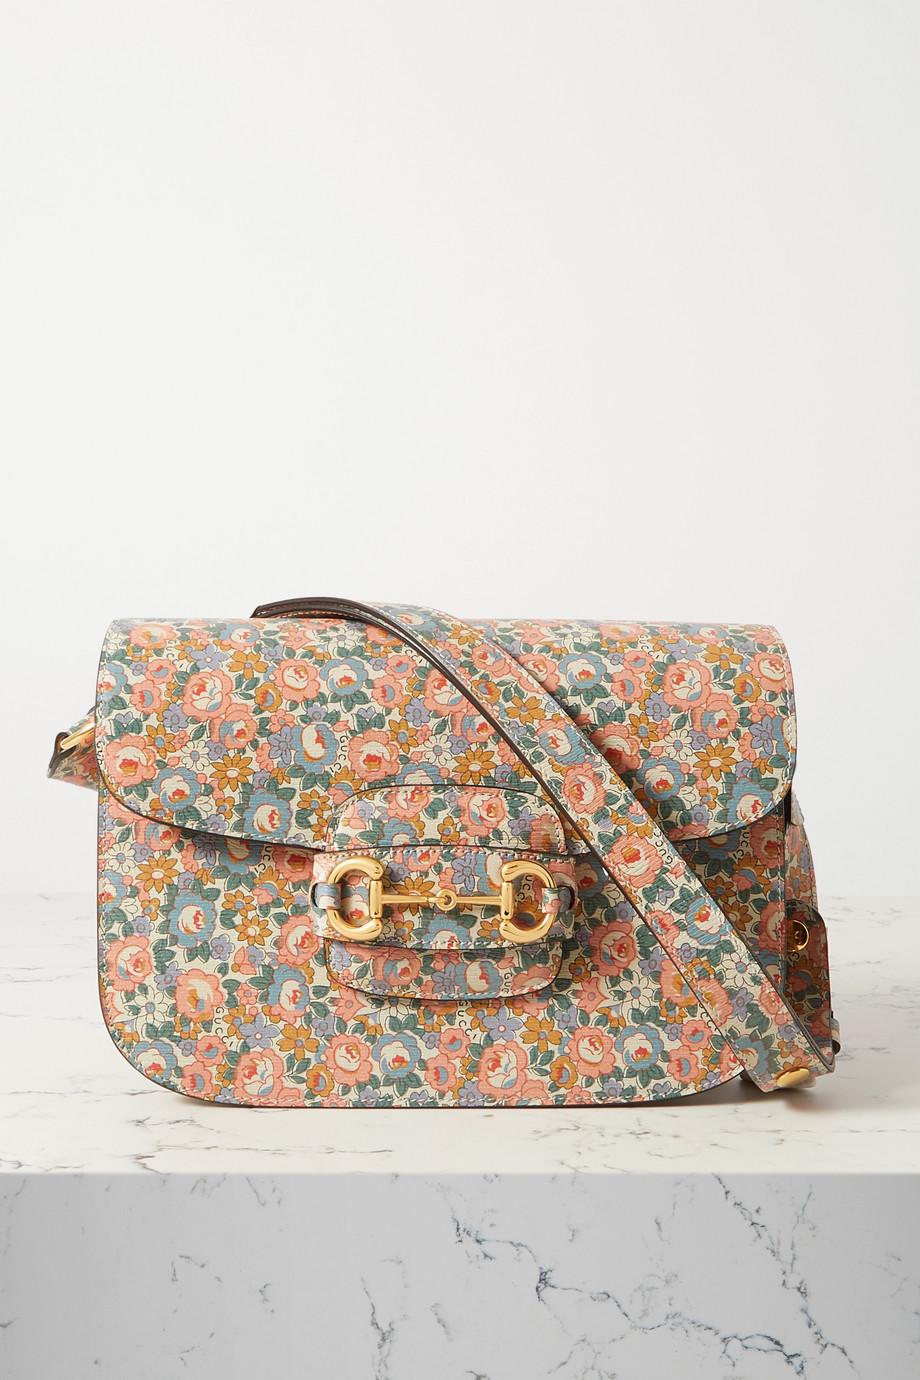 Gucci 1955 Horsebit small floral-print textured-leather shoulder bag